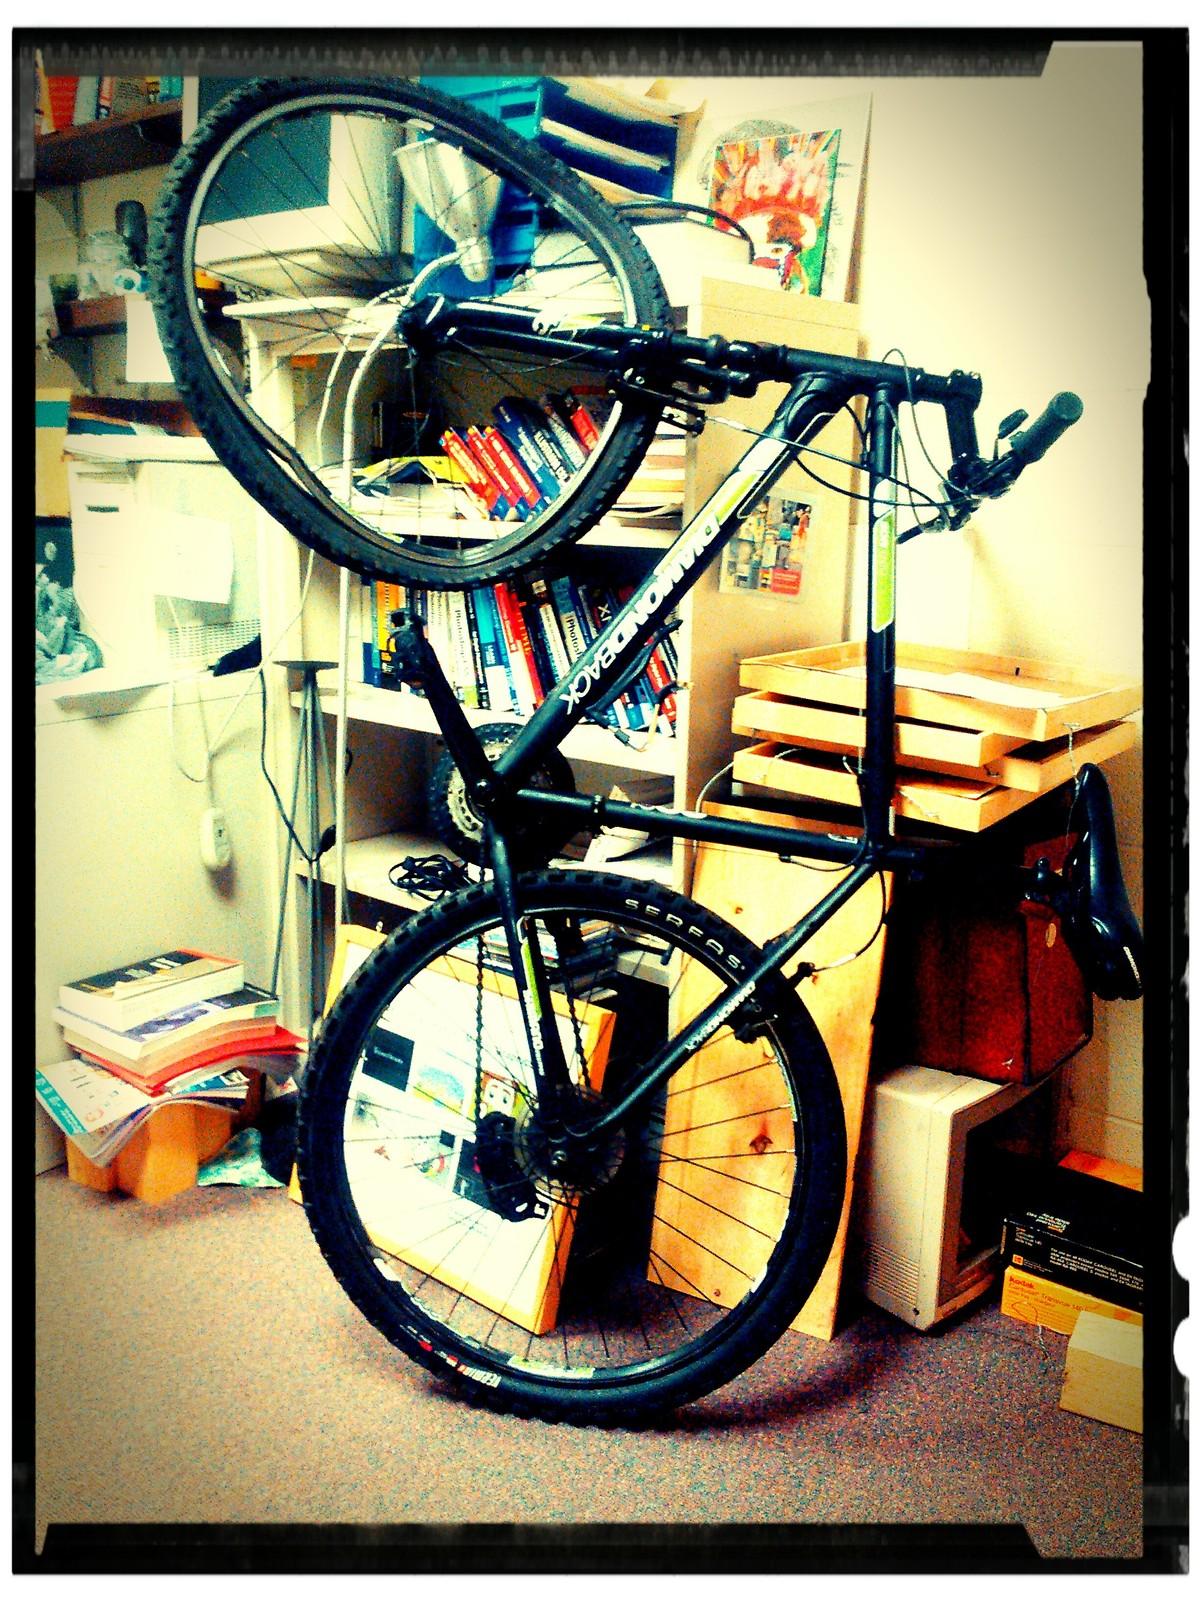 IMG 20141202 211839 - MadMaxFlexin - Mountain Biking Pictures - Vital MTB